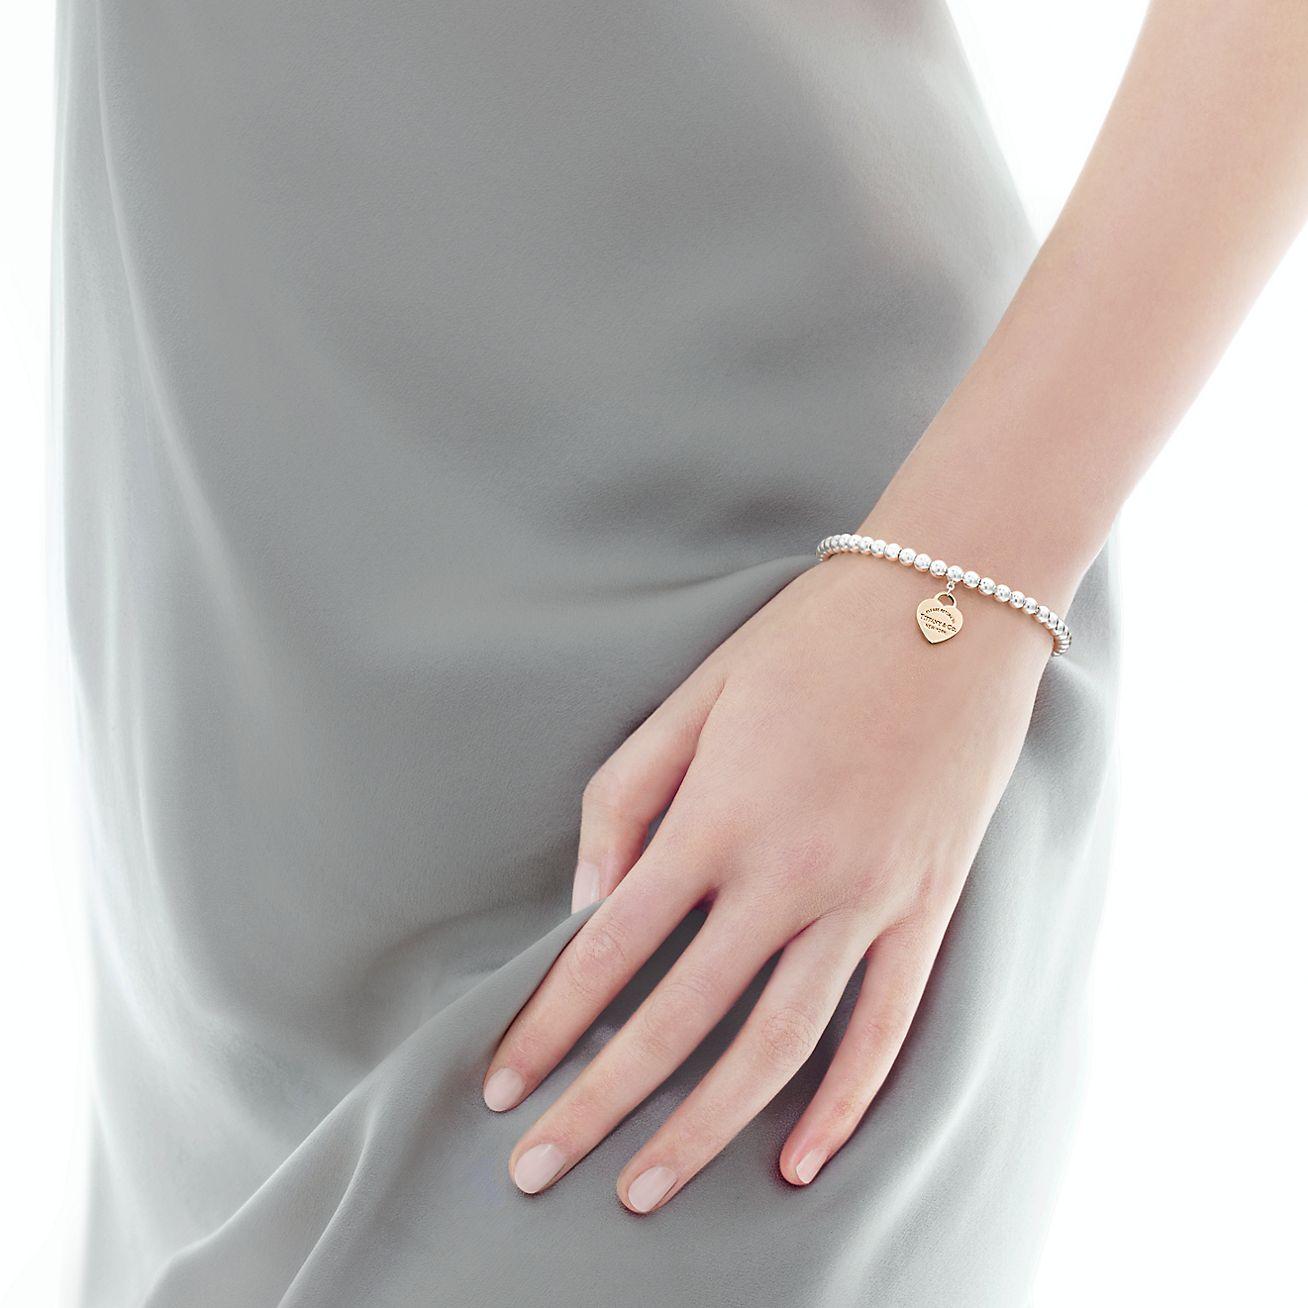 Bead Bracelet In Silver And Rubedo